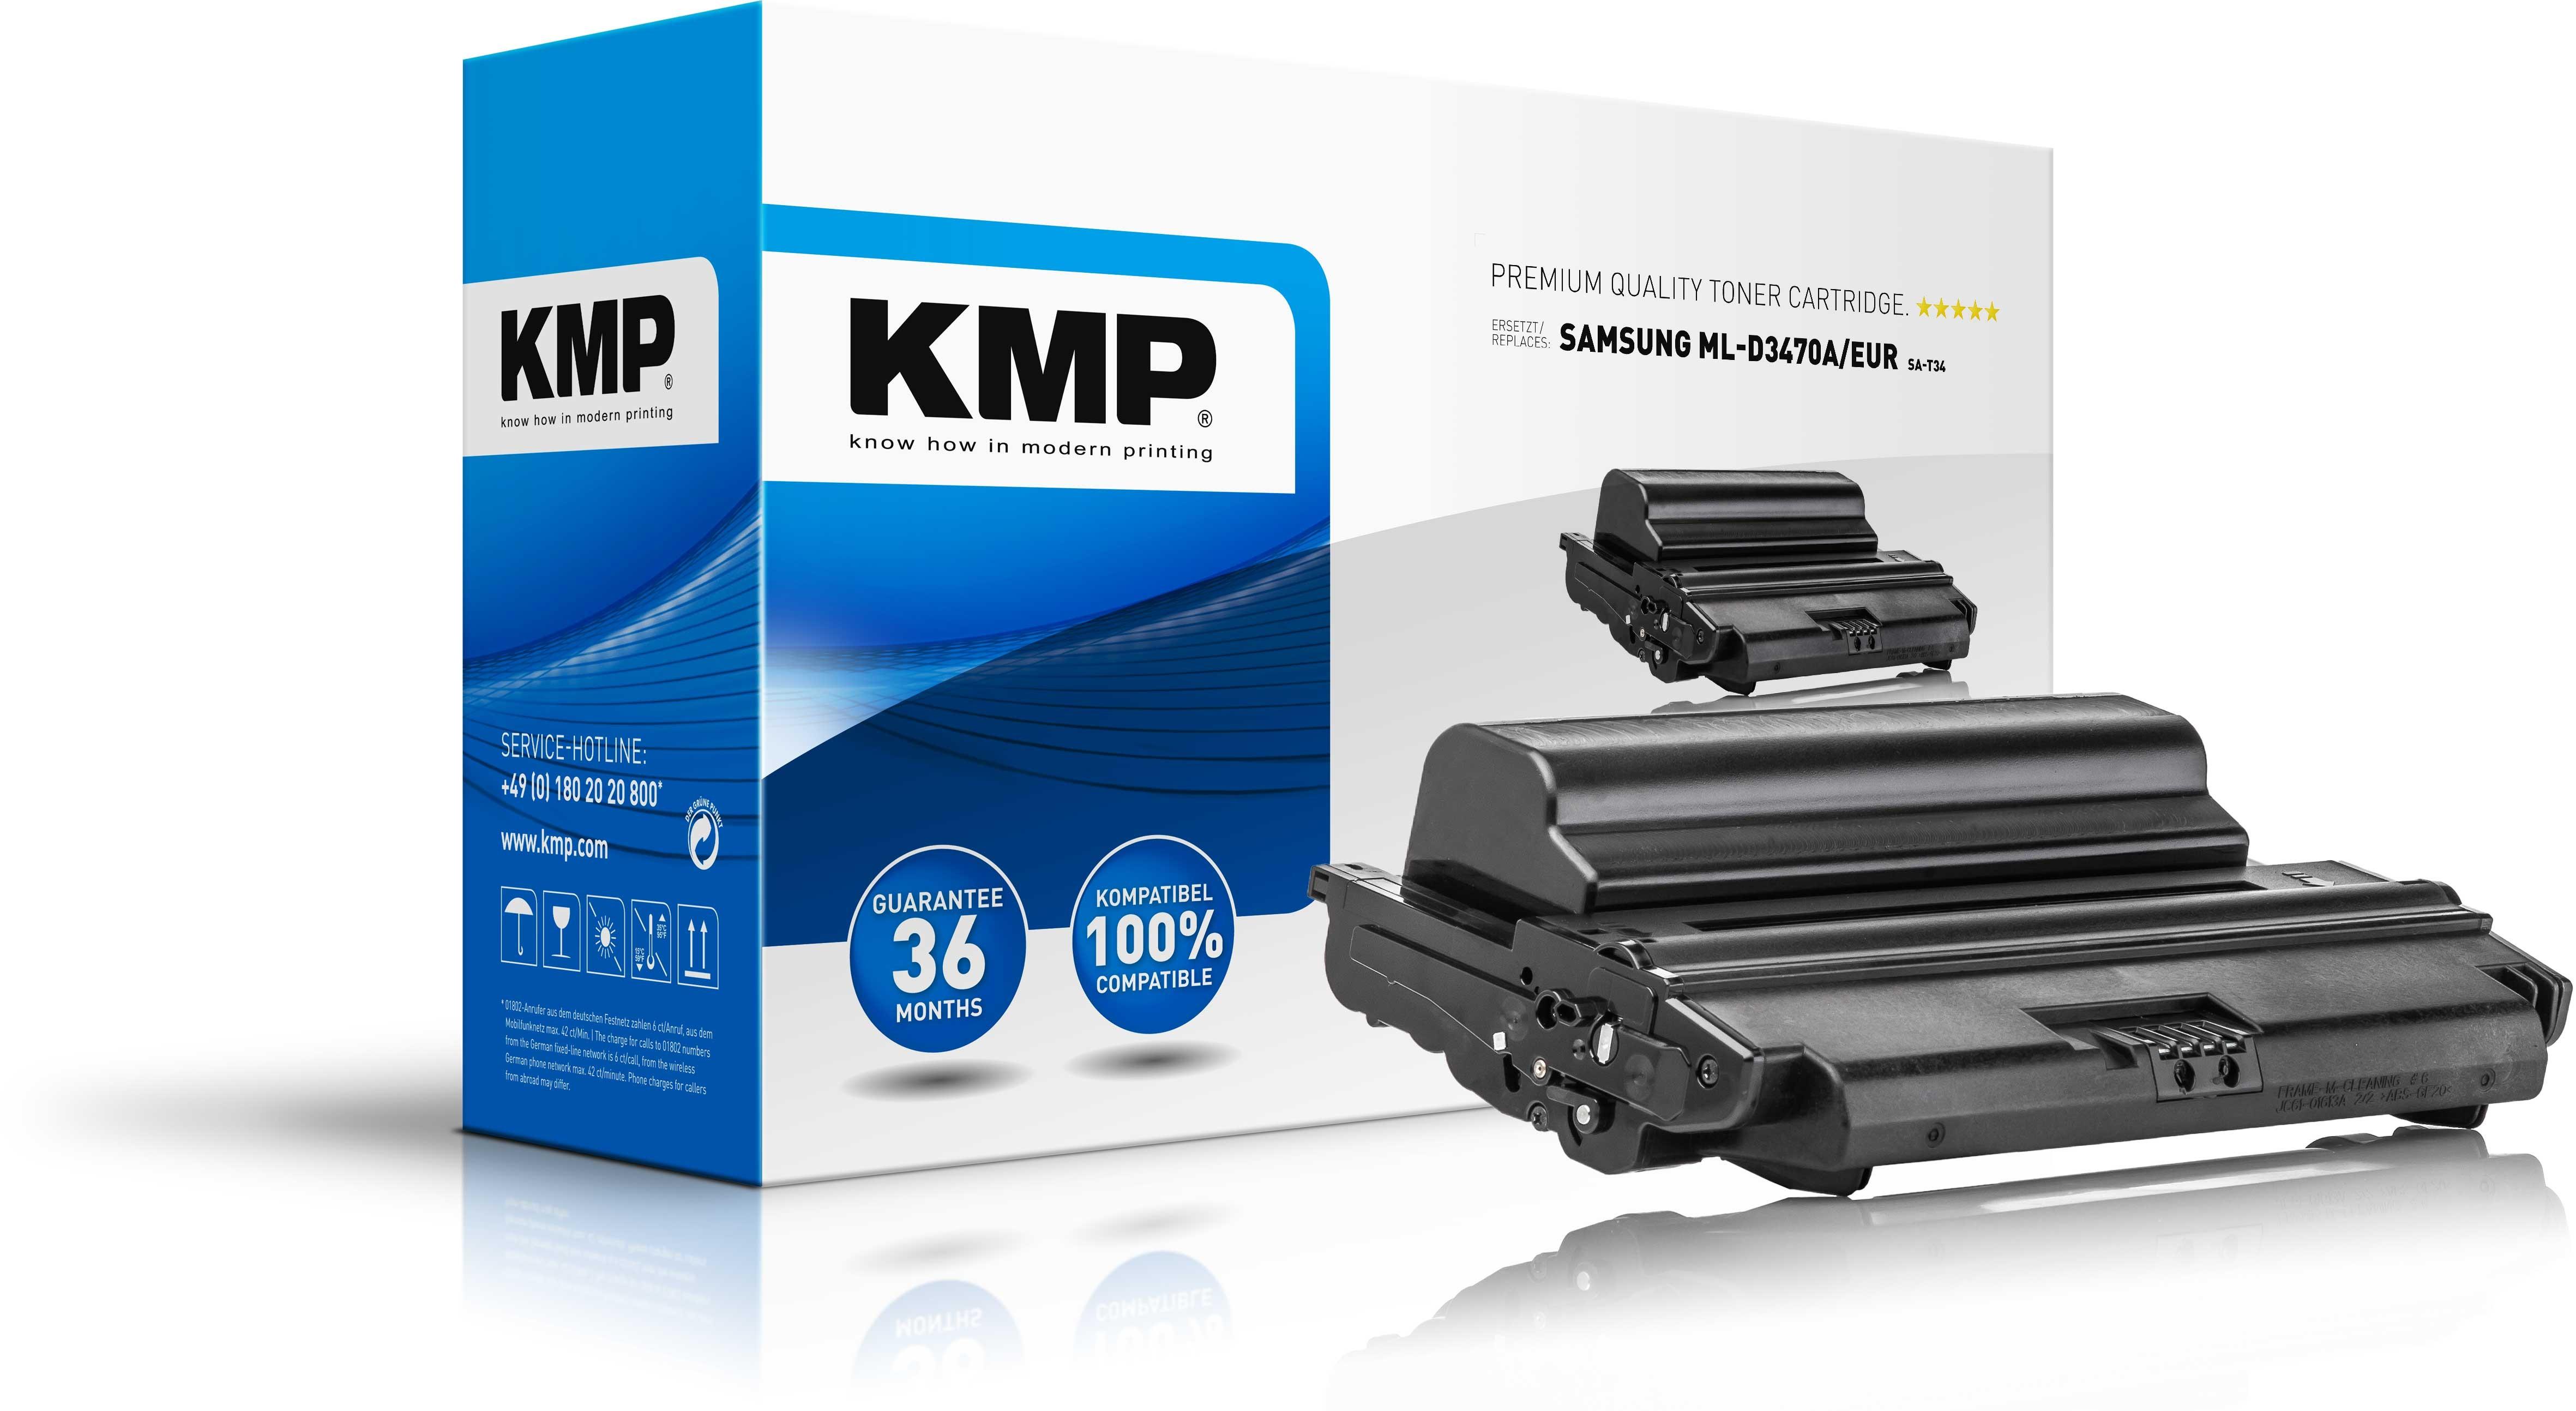 Vorschau: KMP Toner SA-T34 für Samsung MLT-D3470 ELS ML-3470 D / 3471 ND schwarz